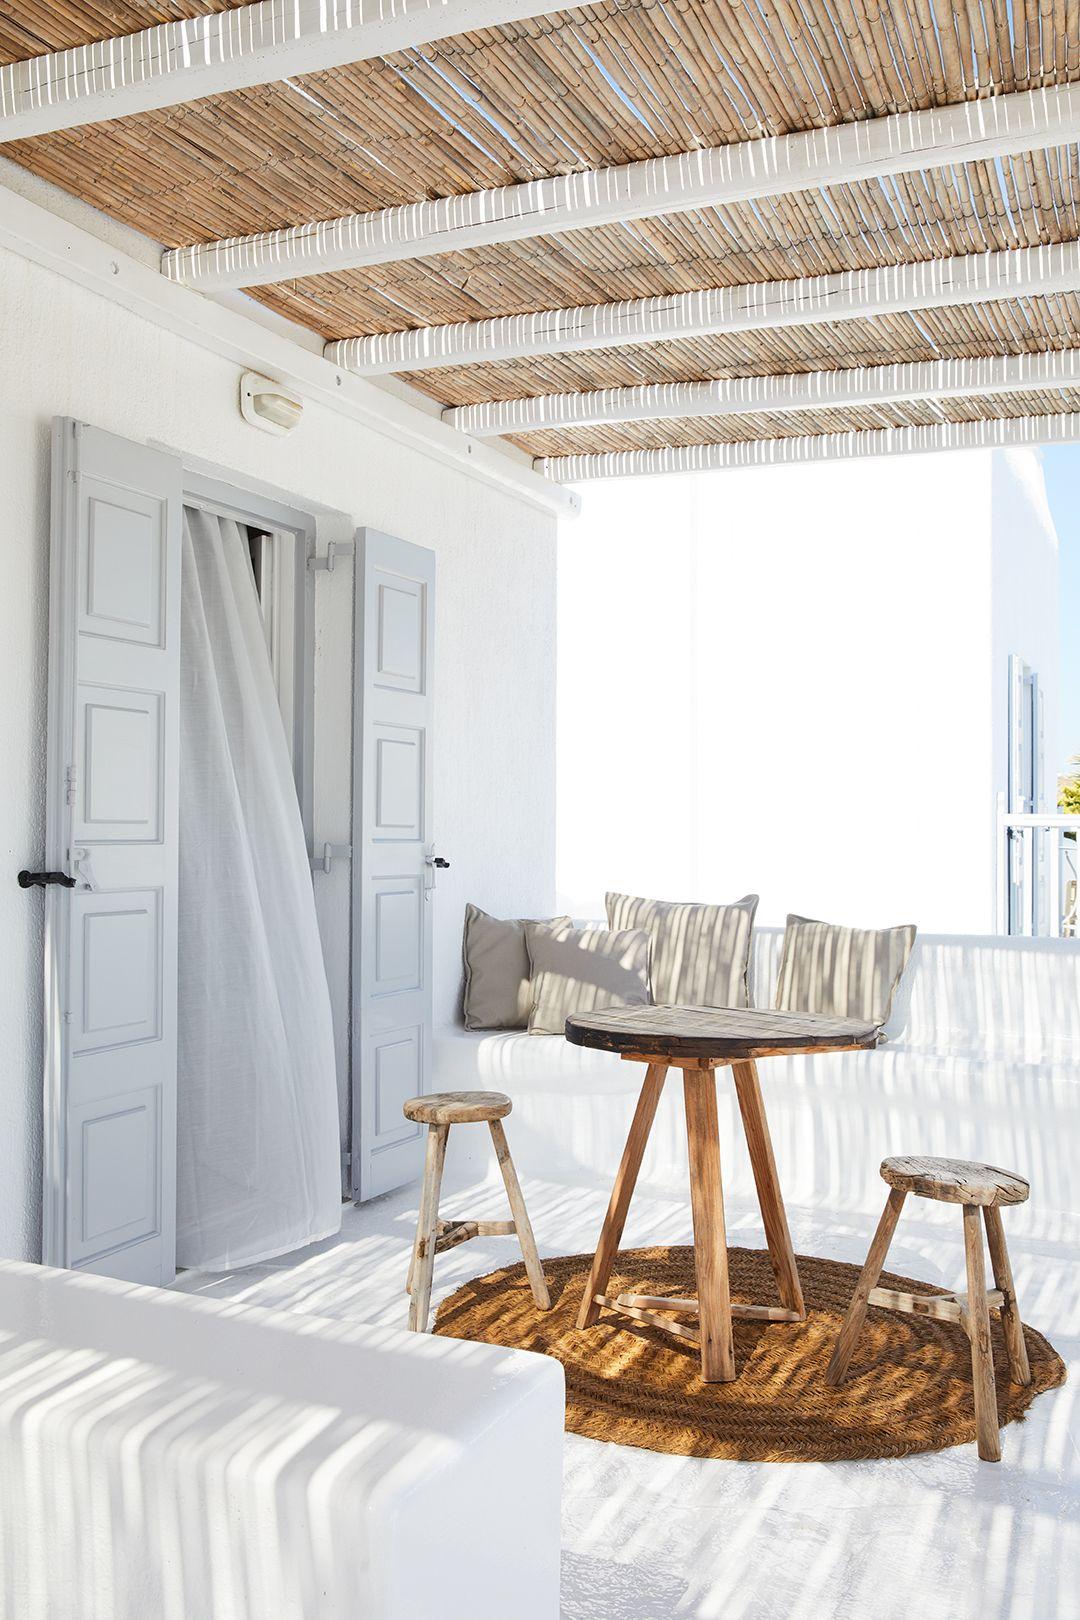 Private Terrace at San Giorgio Mykonos | Exterior of the home ...